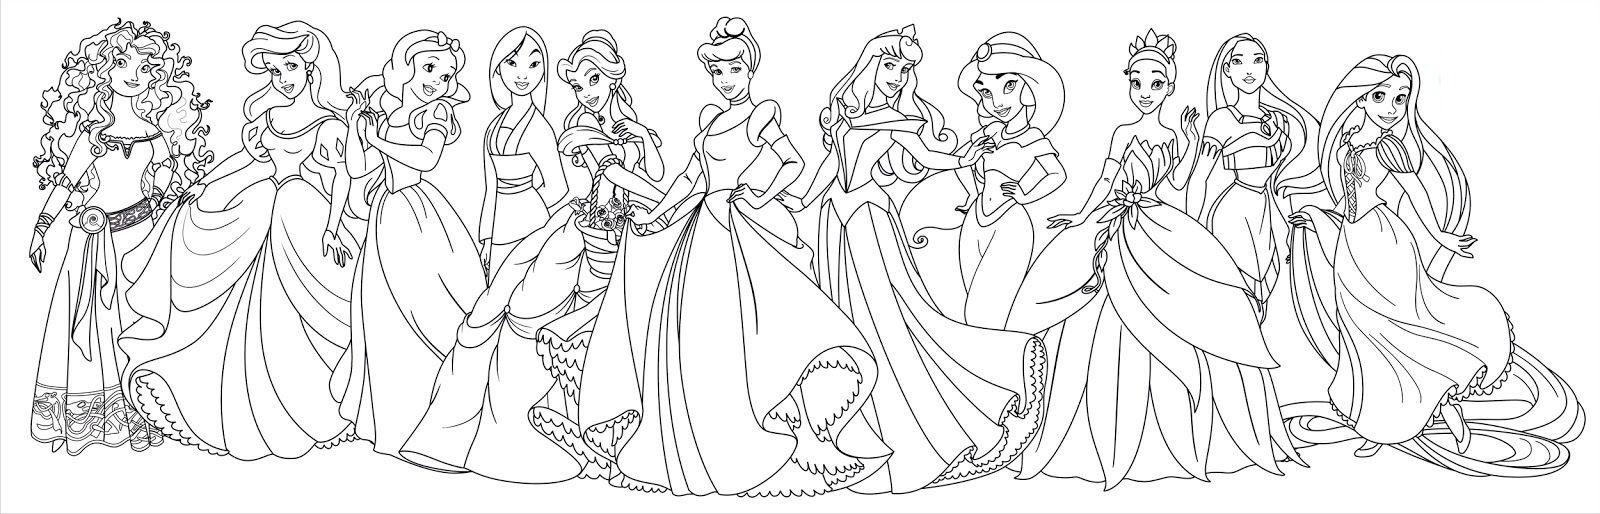 Merida Ariel Snow White Mulan Belle Cinderella Aurora Jasmine Tiana Pocahonta Disney Princess Coloring Pages Disney Princess Colors Princess Coloring